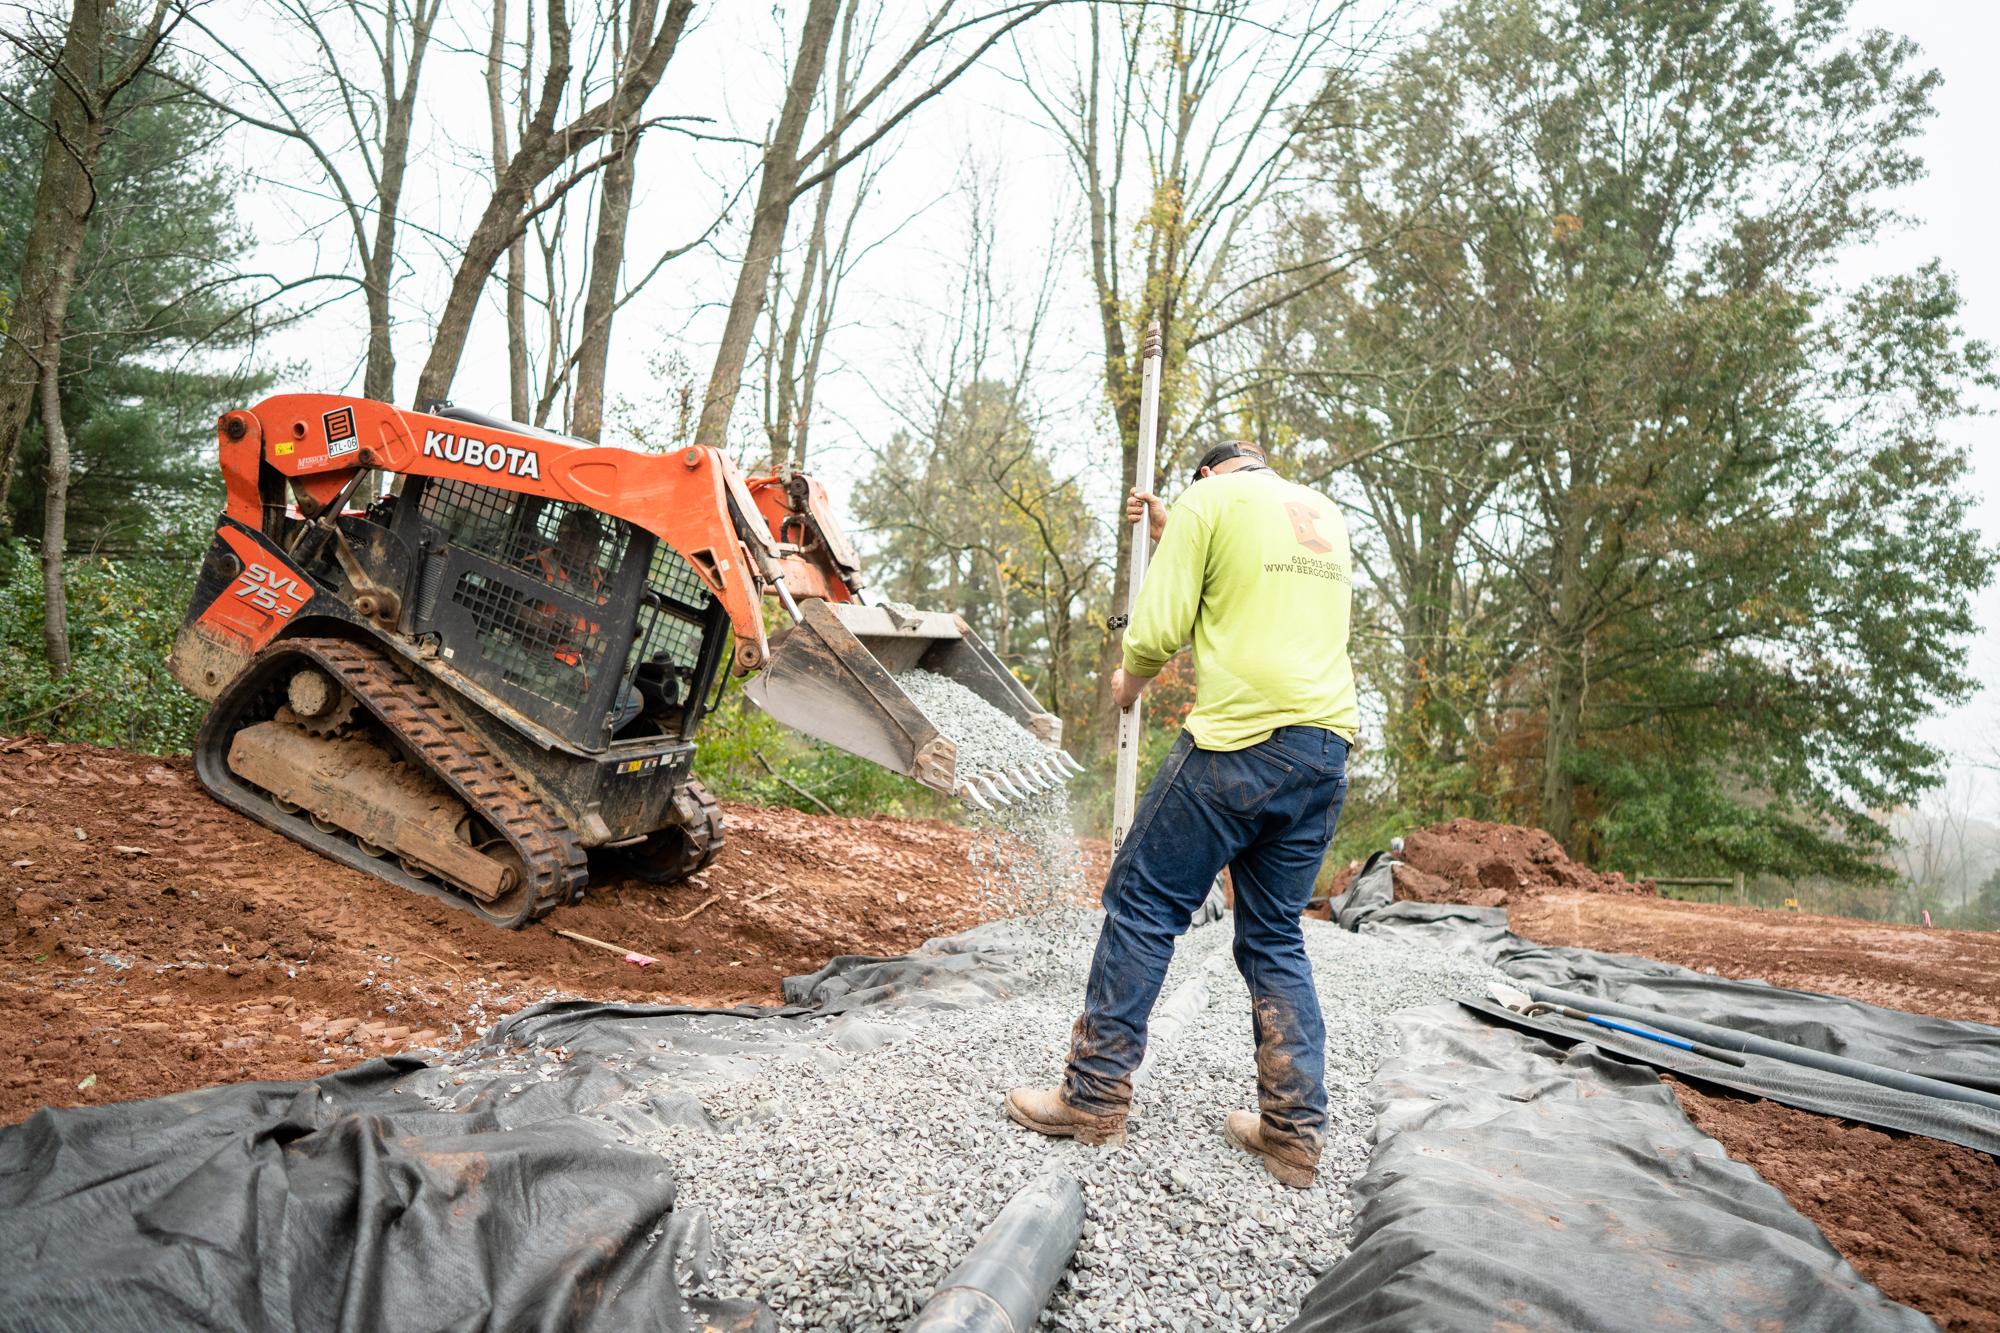 Small Kubota Bulldozer Dumping Gravel Over a Pipe with a Berg Team Member Supervising